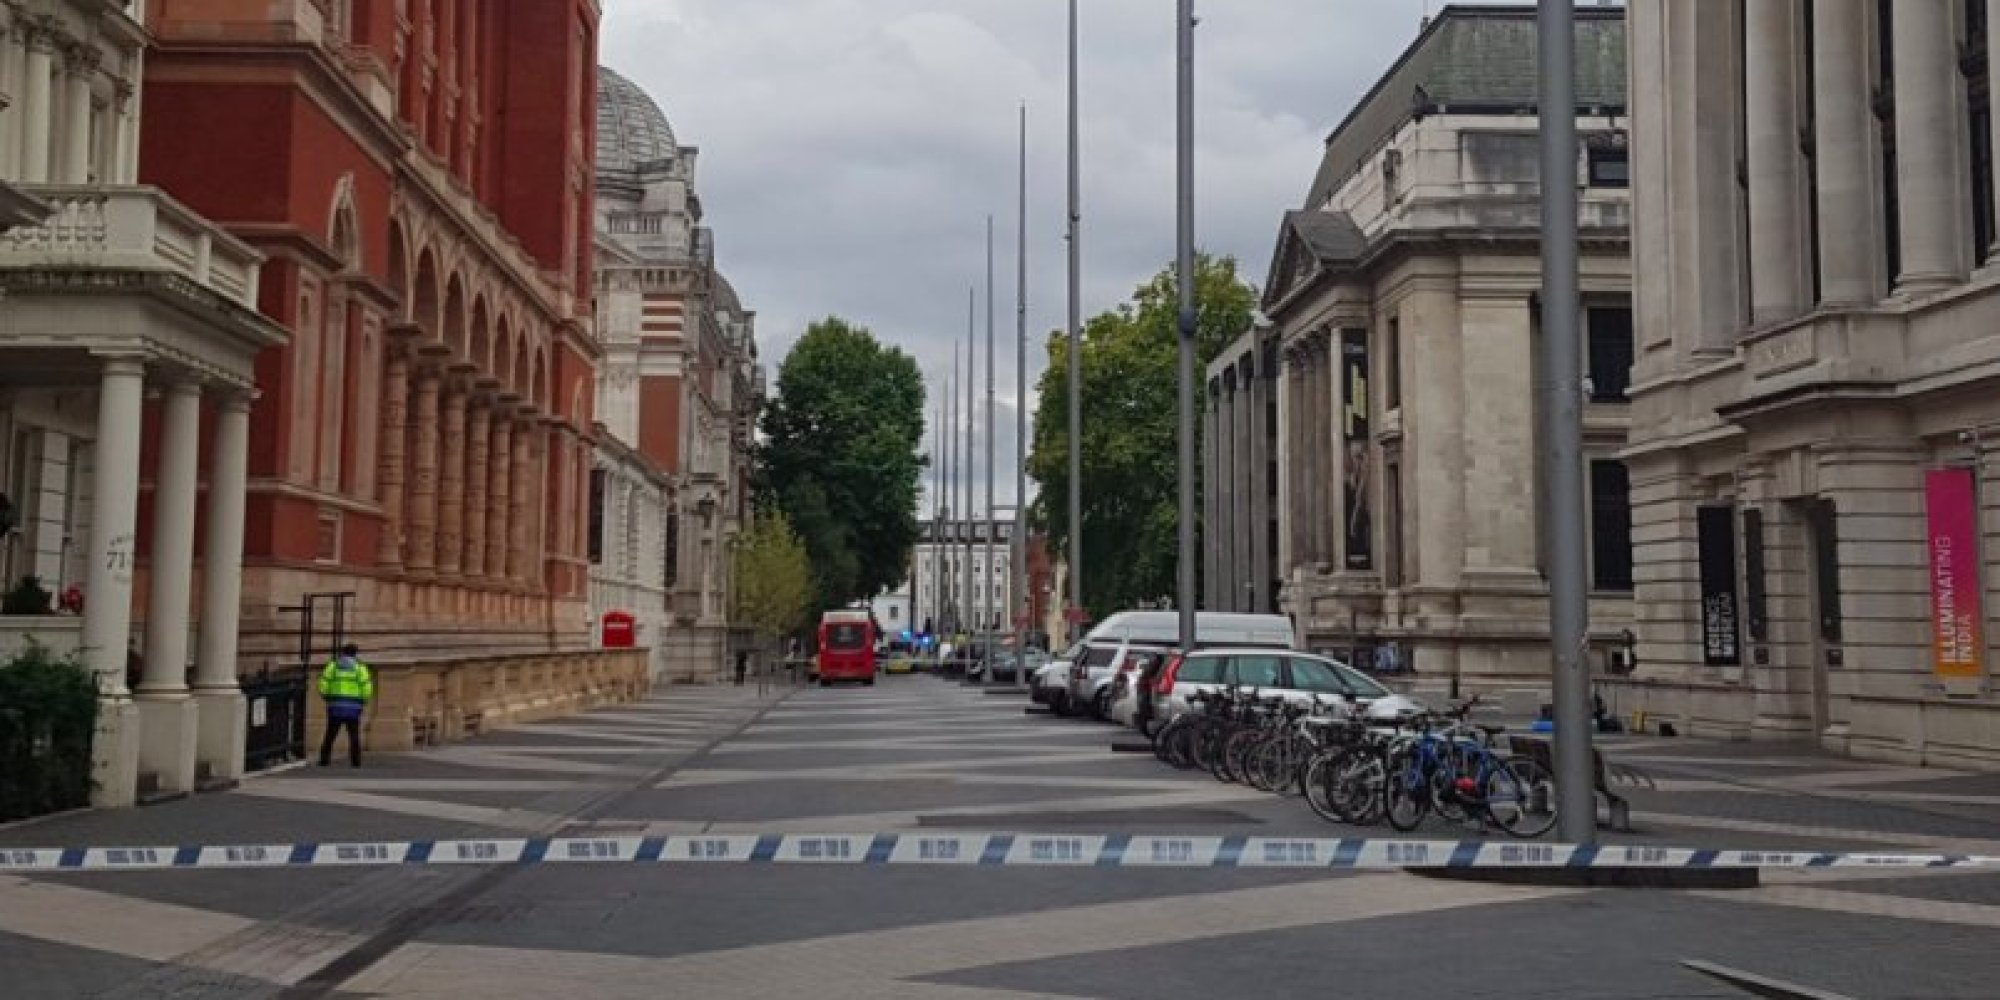 auto f hrt in menschenmenge in london mehrere museen evakuiert. Black Bedroom Furniture Sets. Home Design Ideas